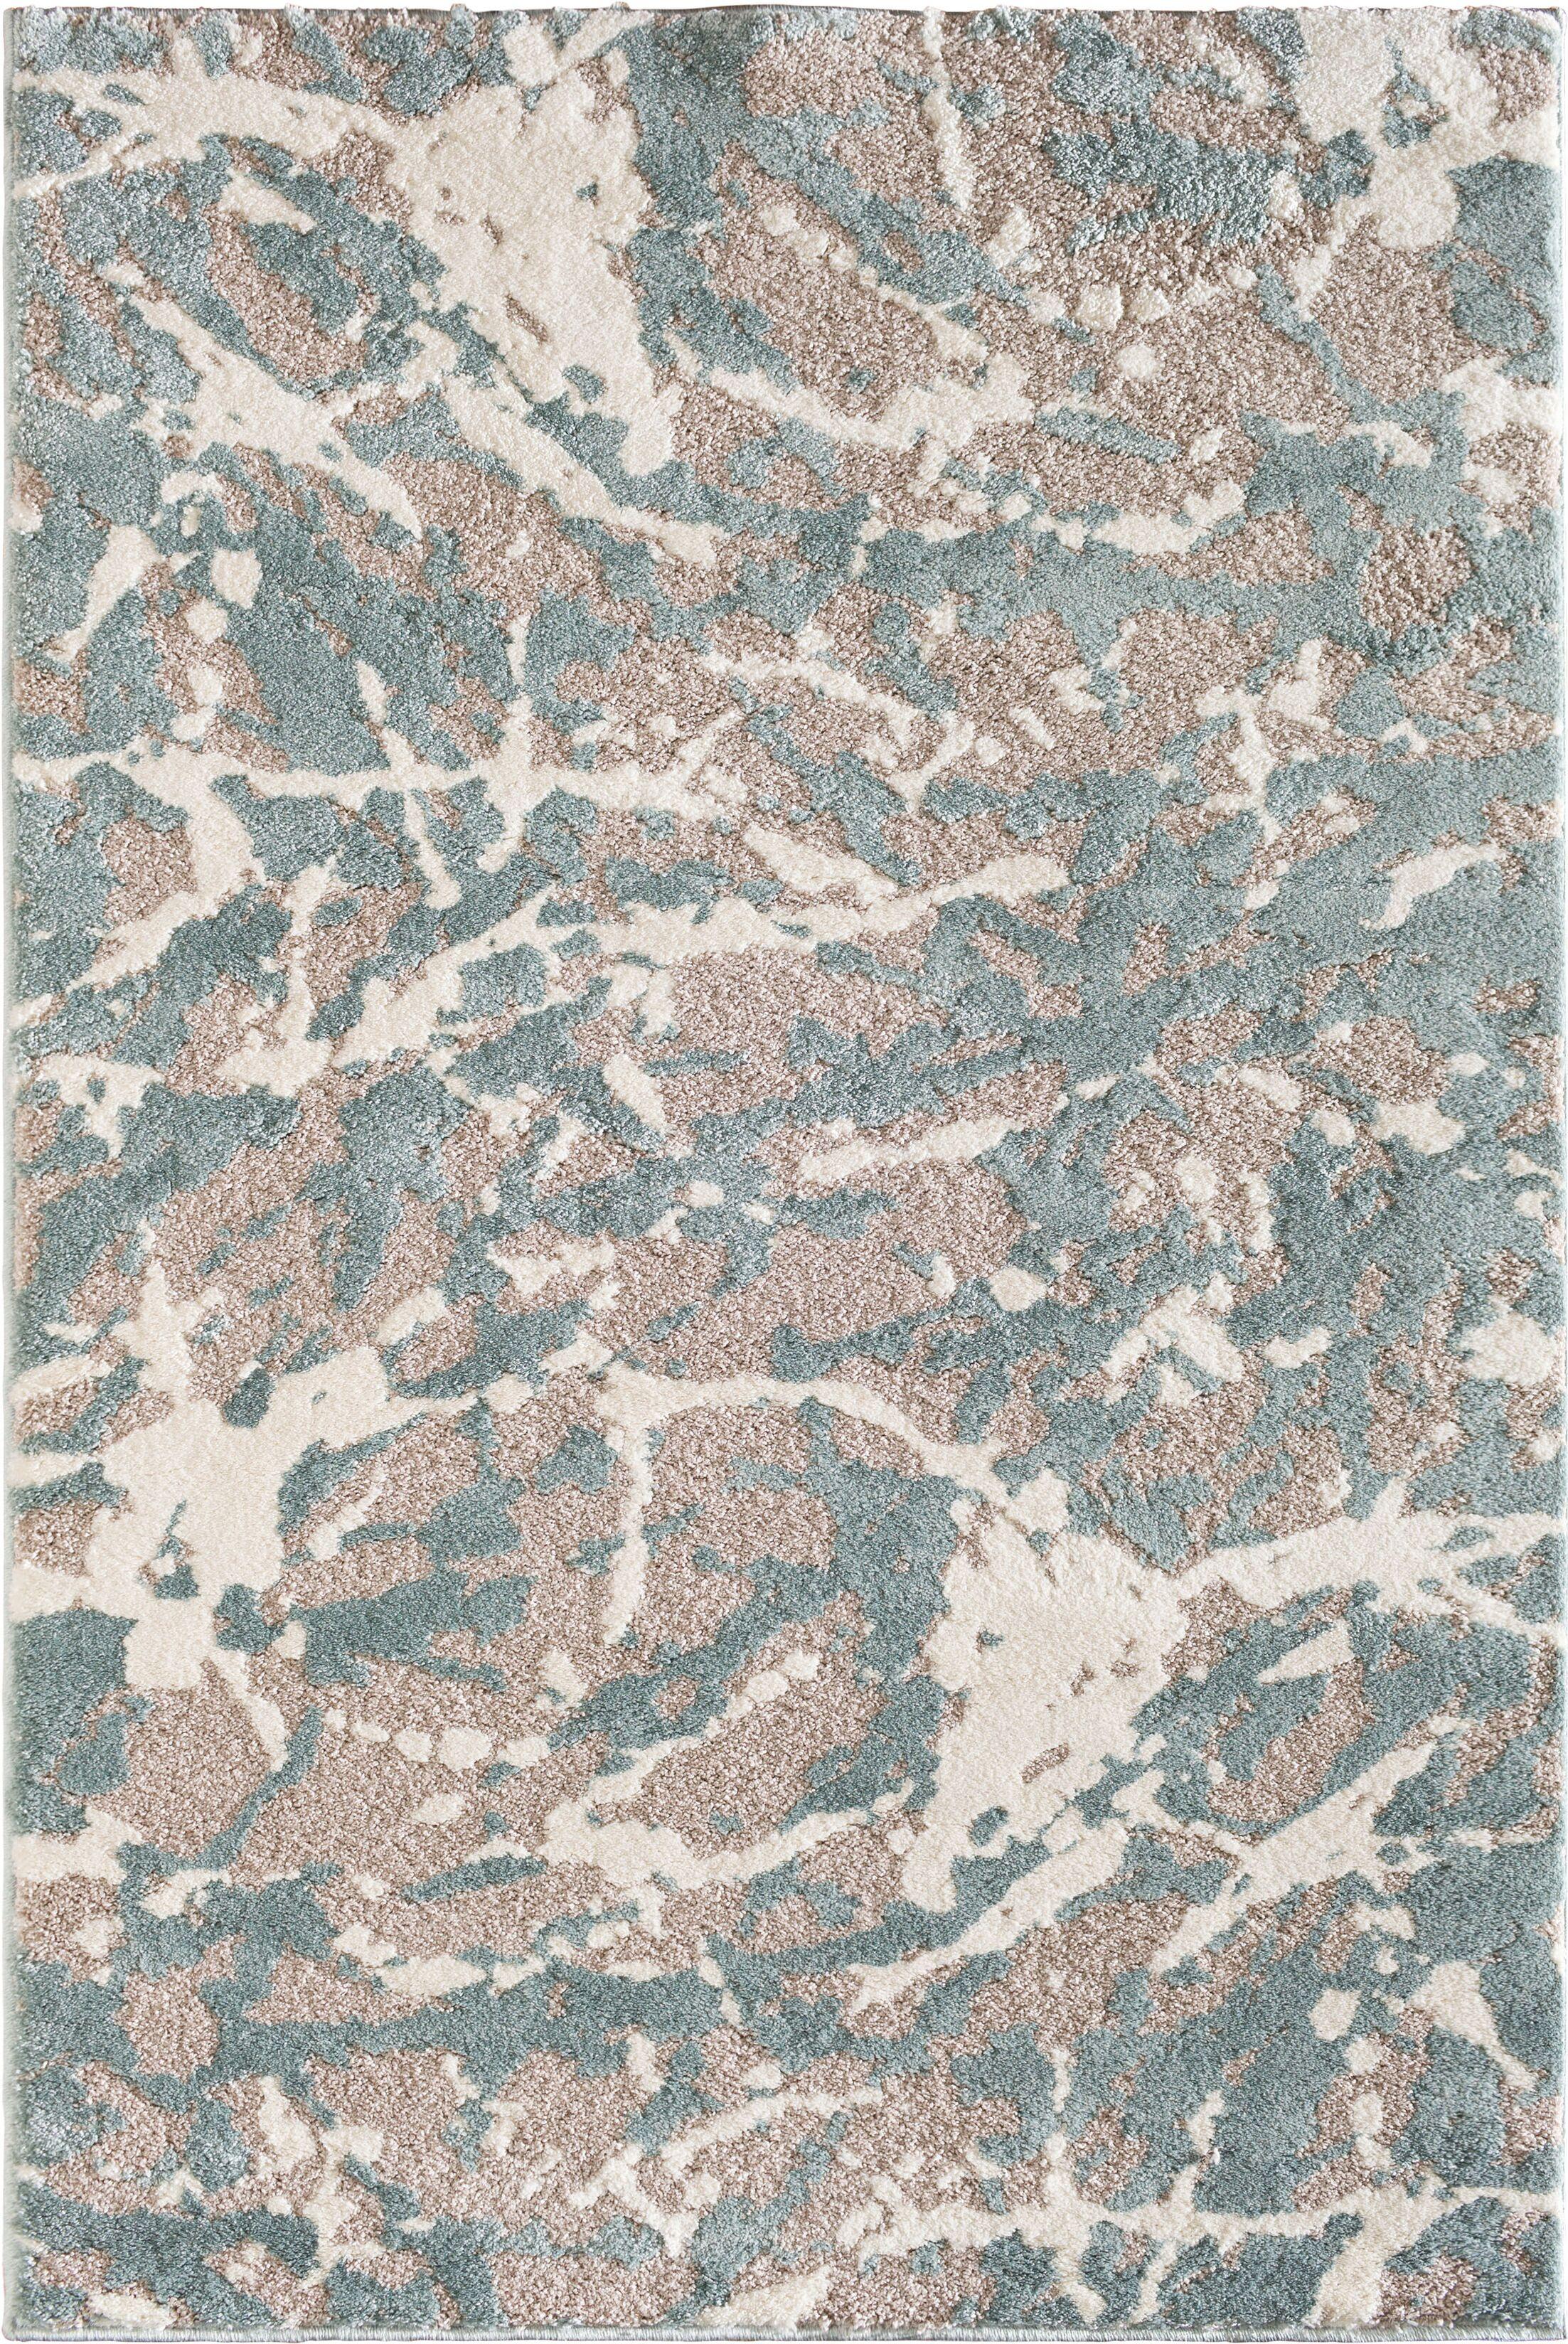 Wabasha Glass Gray/White Area Rug Rug Size: 7'10